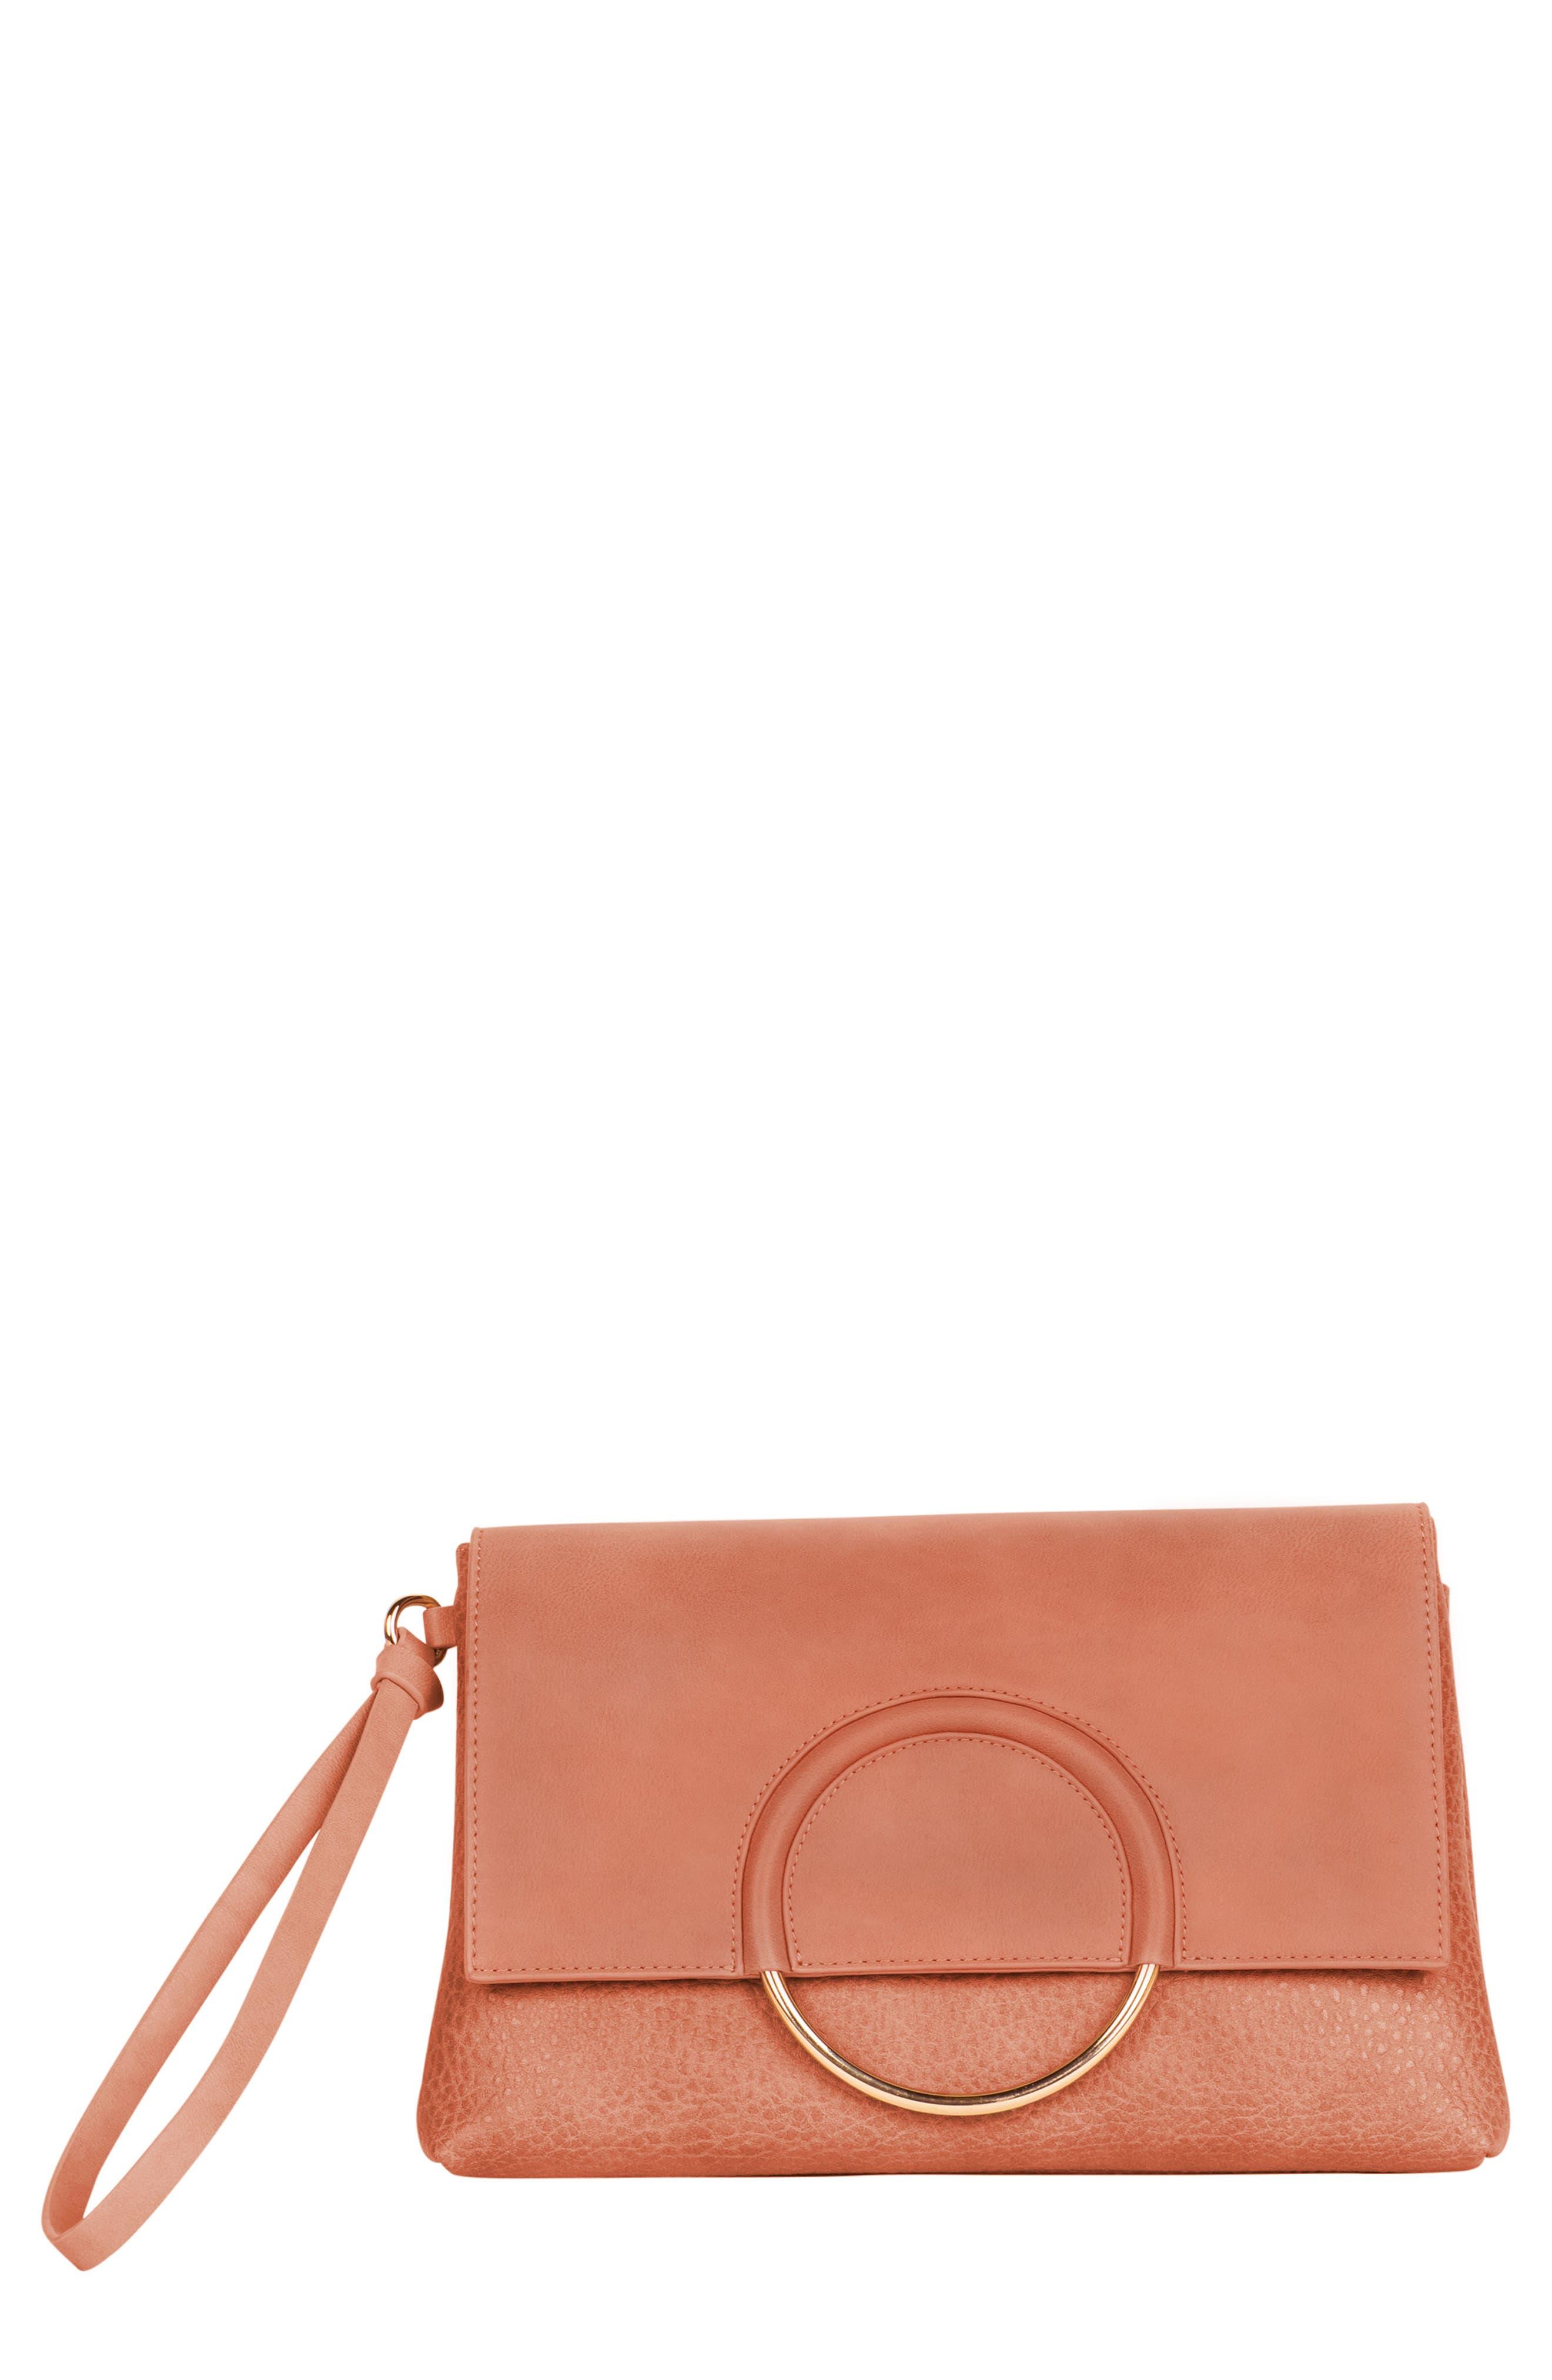 Urban Originals Custom Vegan Leather Wristlet Clutch - Pink